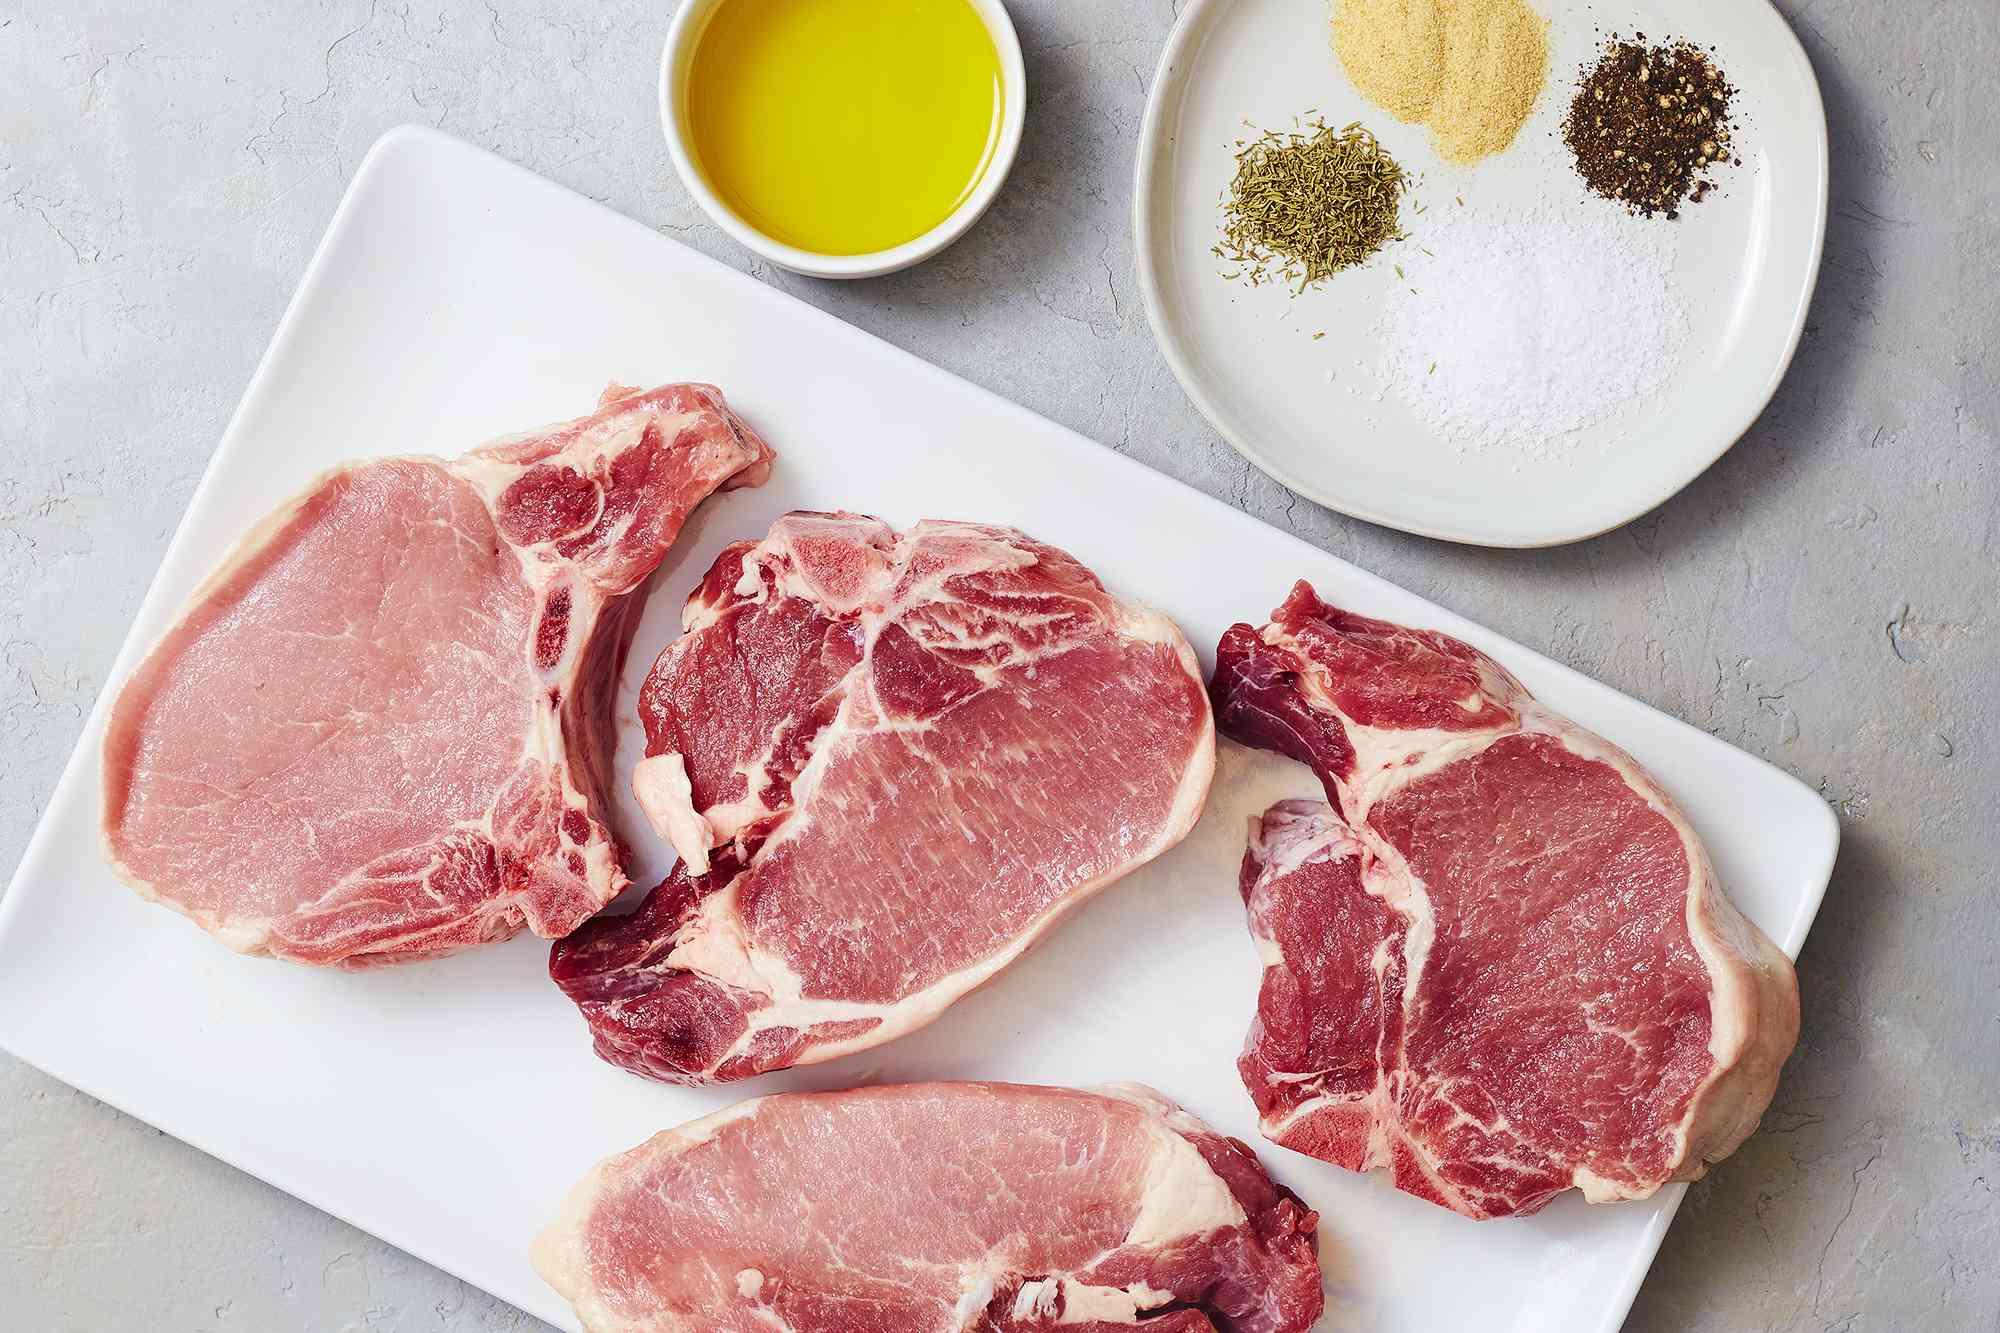 Ingredients for oven-roasted pork chops